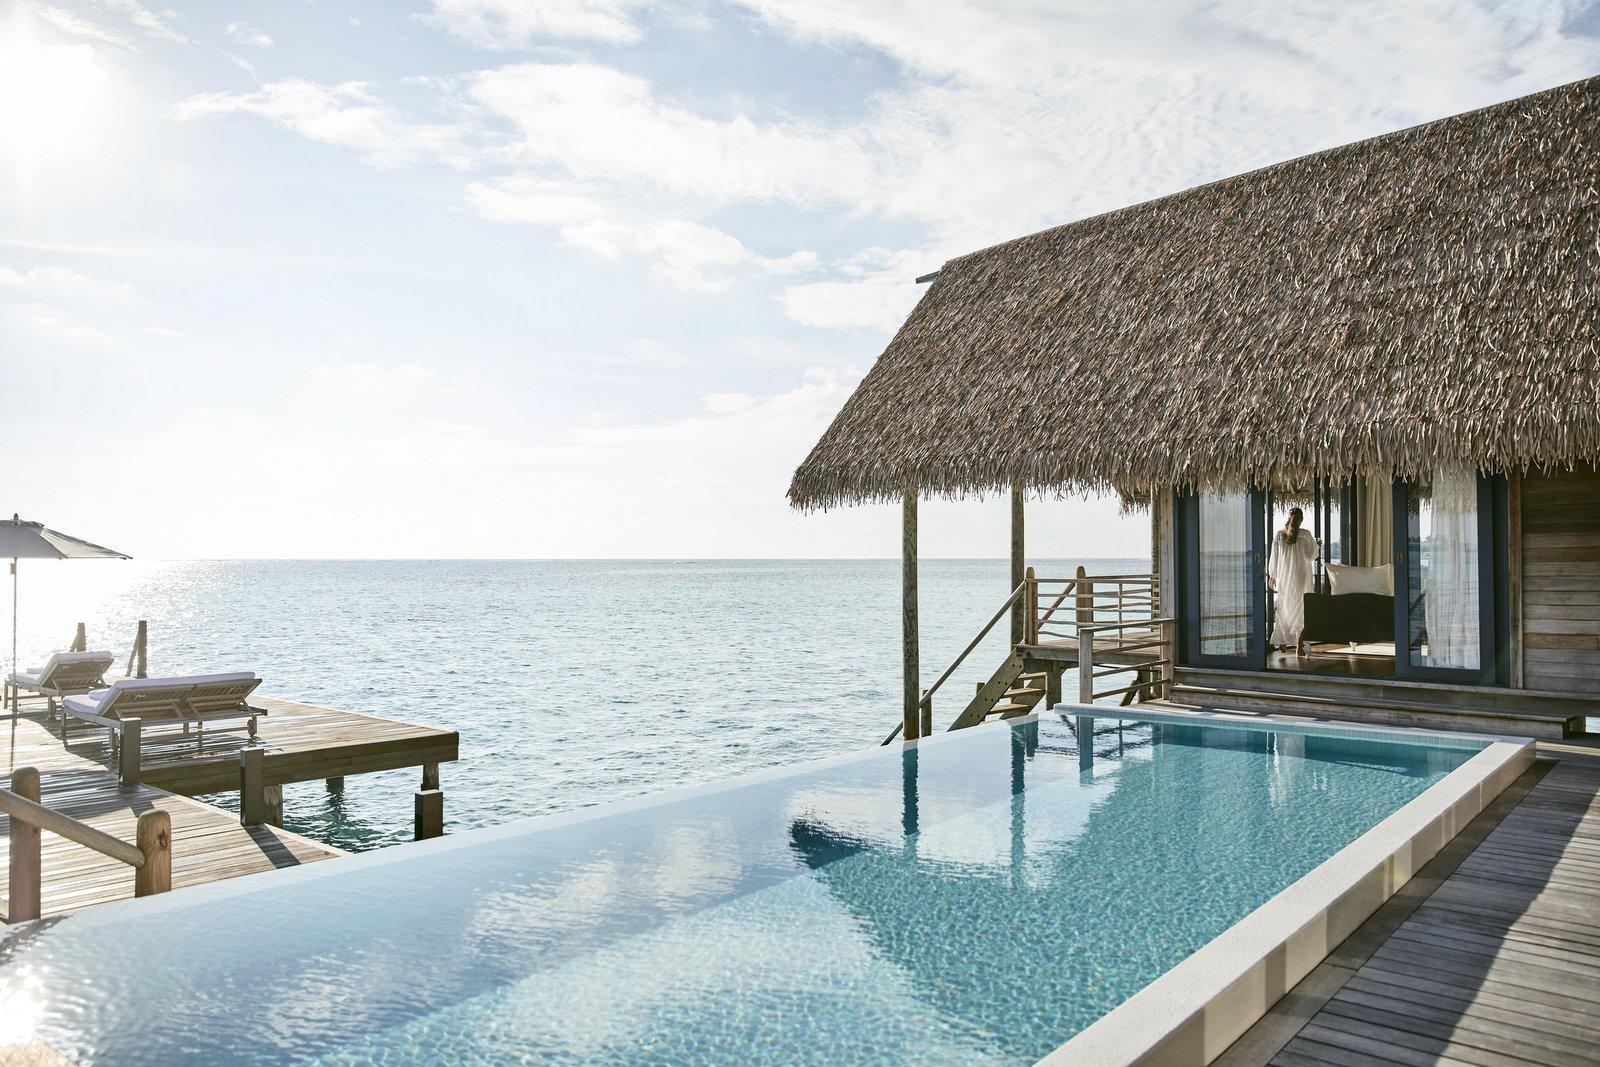 Мальдивы, Отель COMO Cocoa Island, номер Cocoa Water Villa with Pool